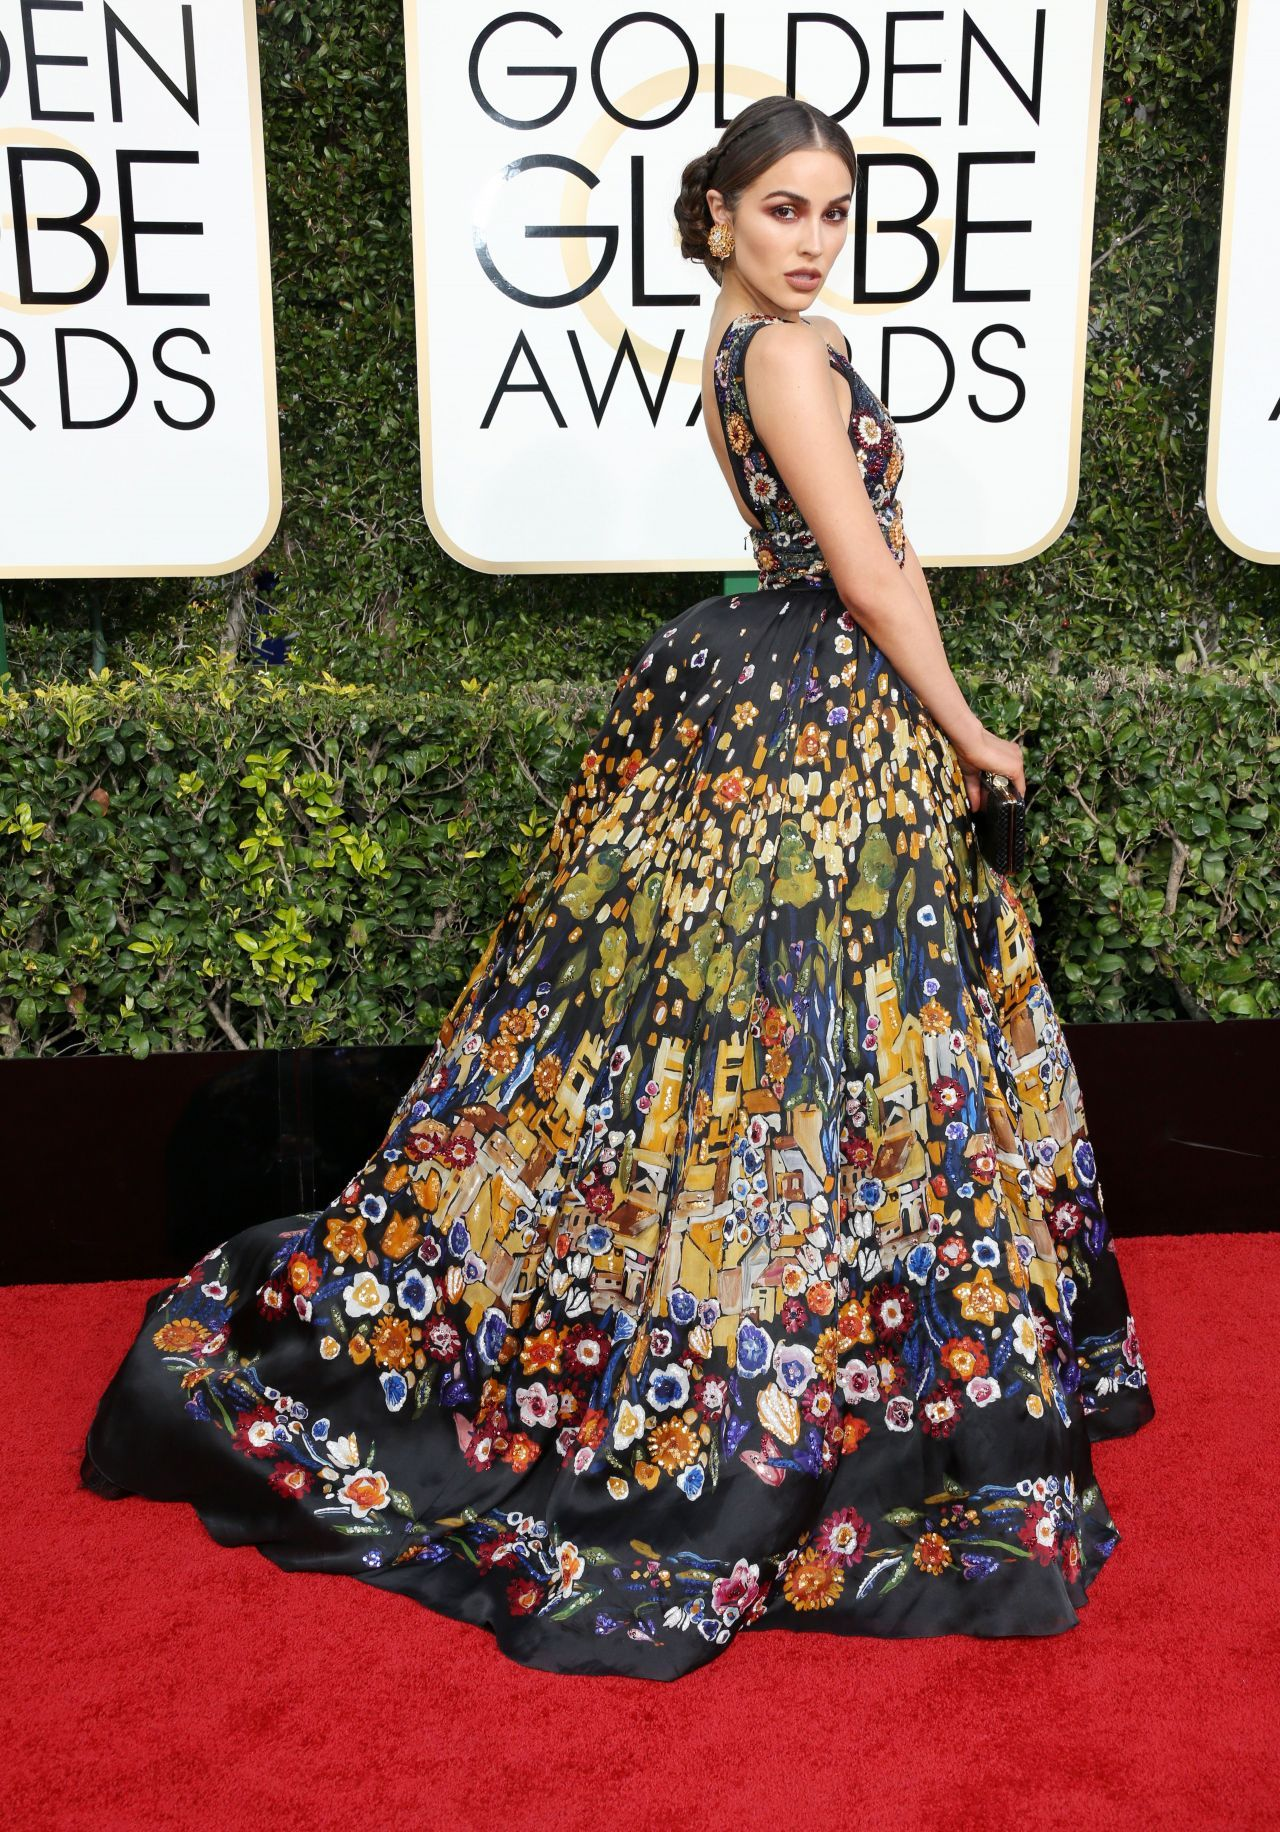 Golden globe dresses 2018 fashion police